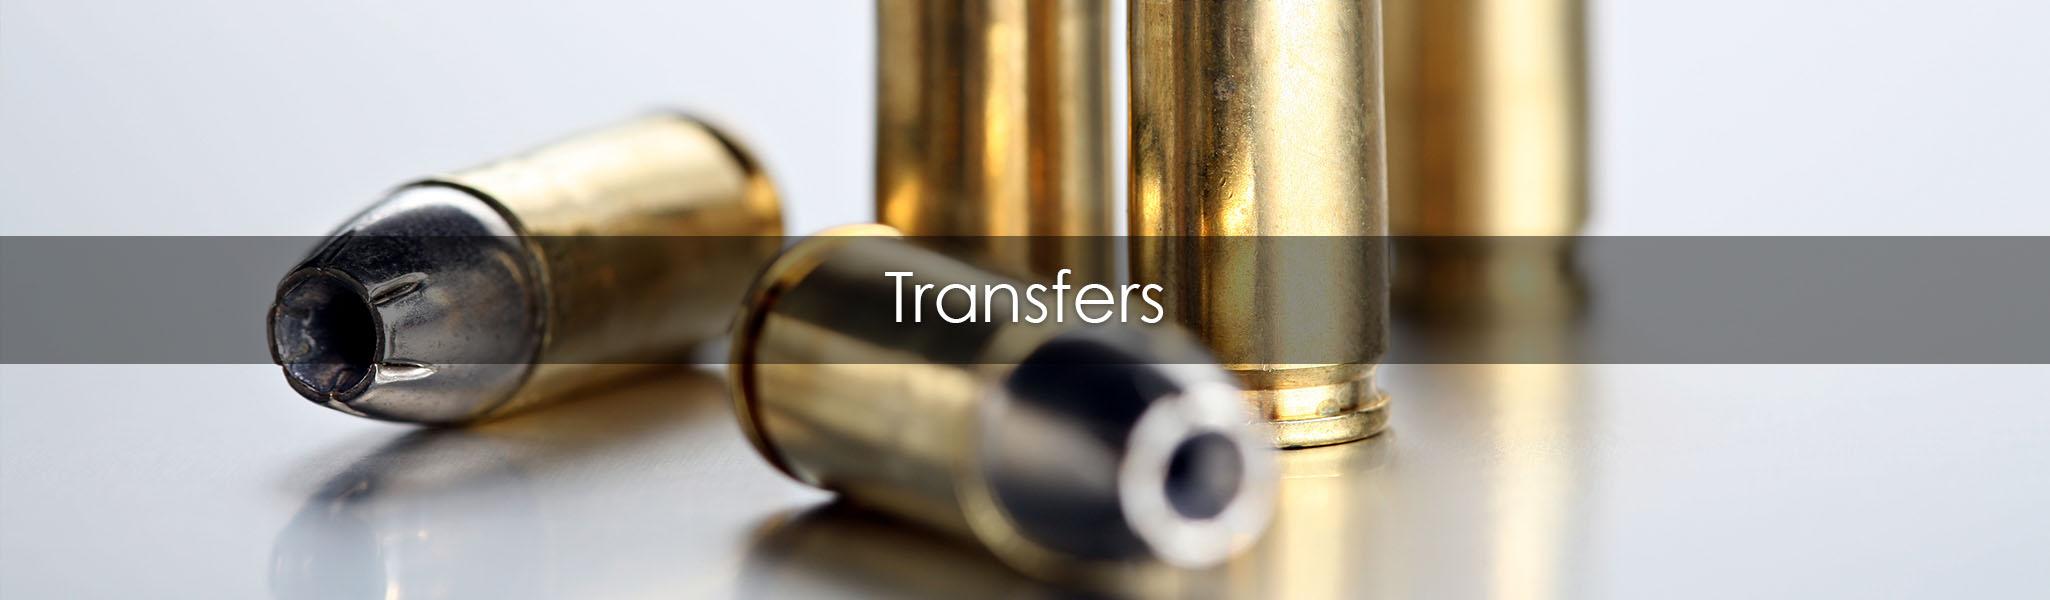 Transfers - 2050x600 interior sliders